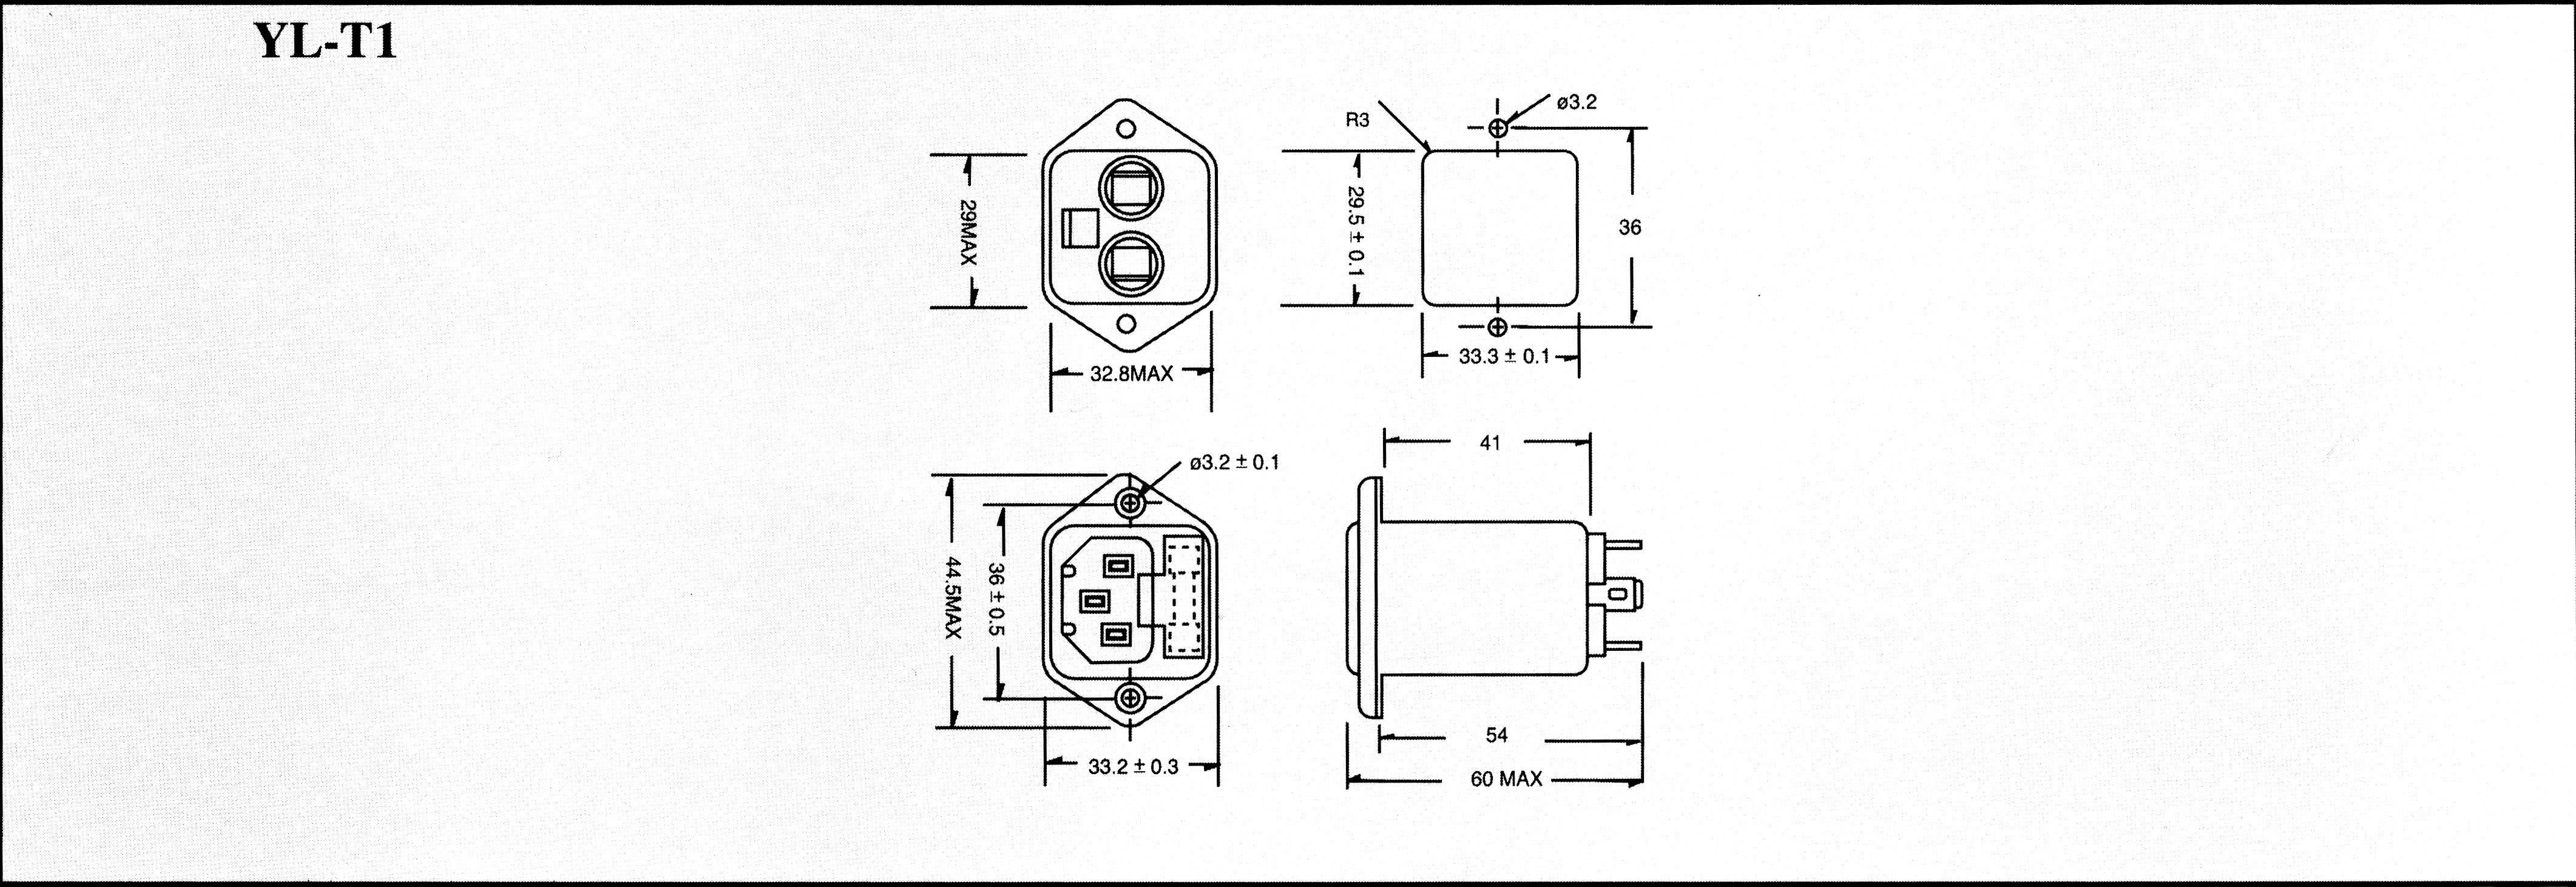 Síťový filtr Yunpen YL03T1, 2 x 1,8 mH, 125/250 V/AC, (50/60 Hz,) 3 A